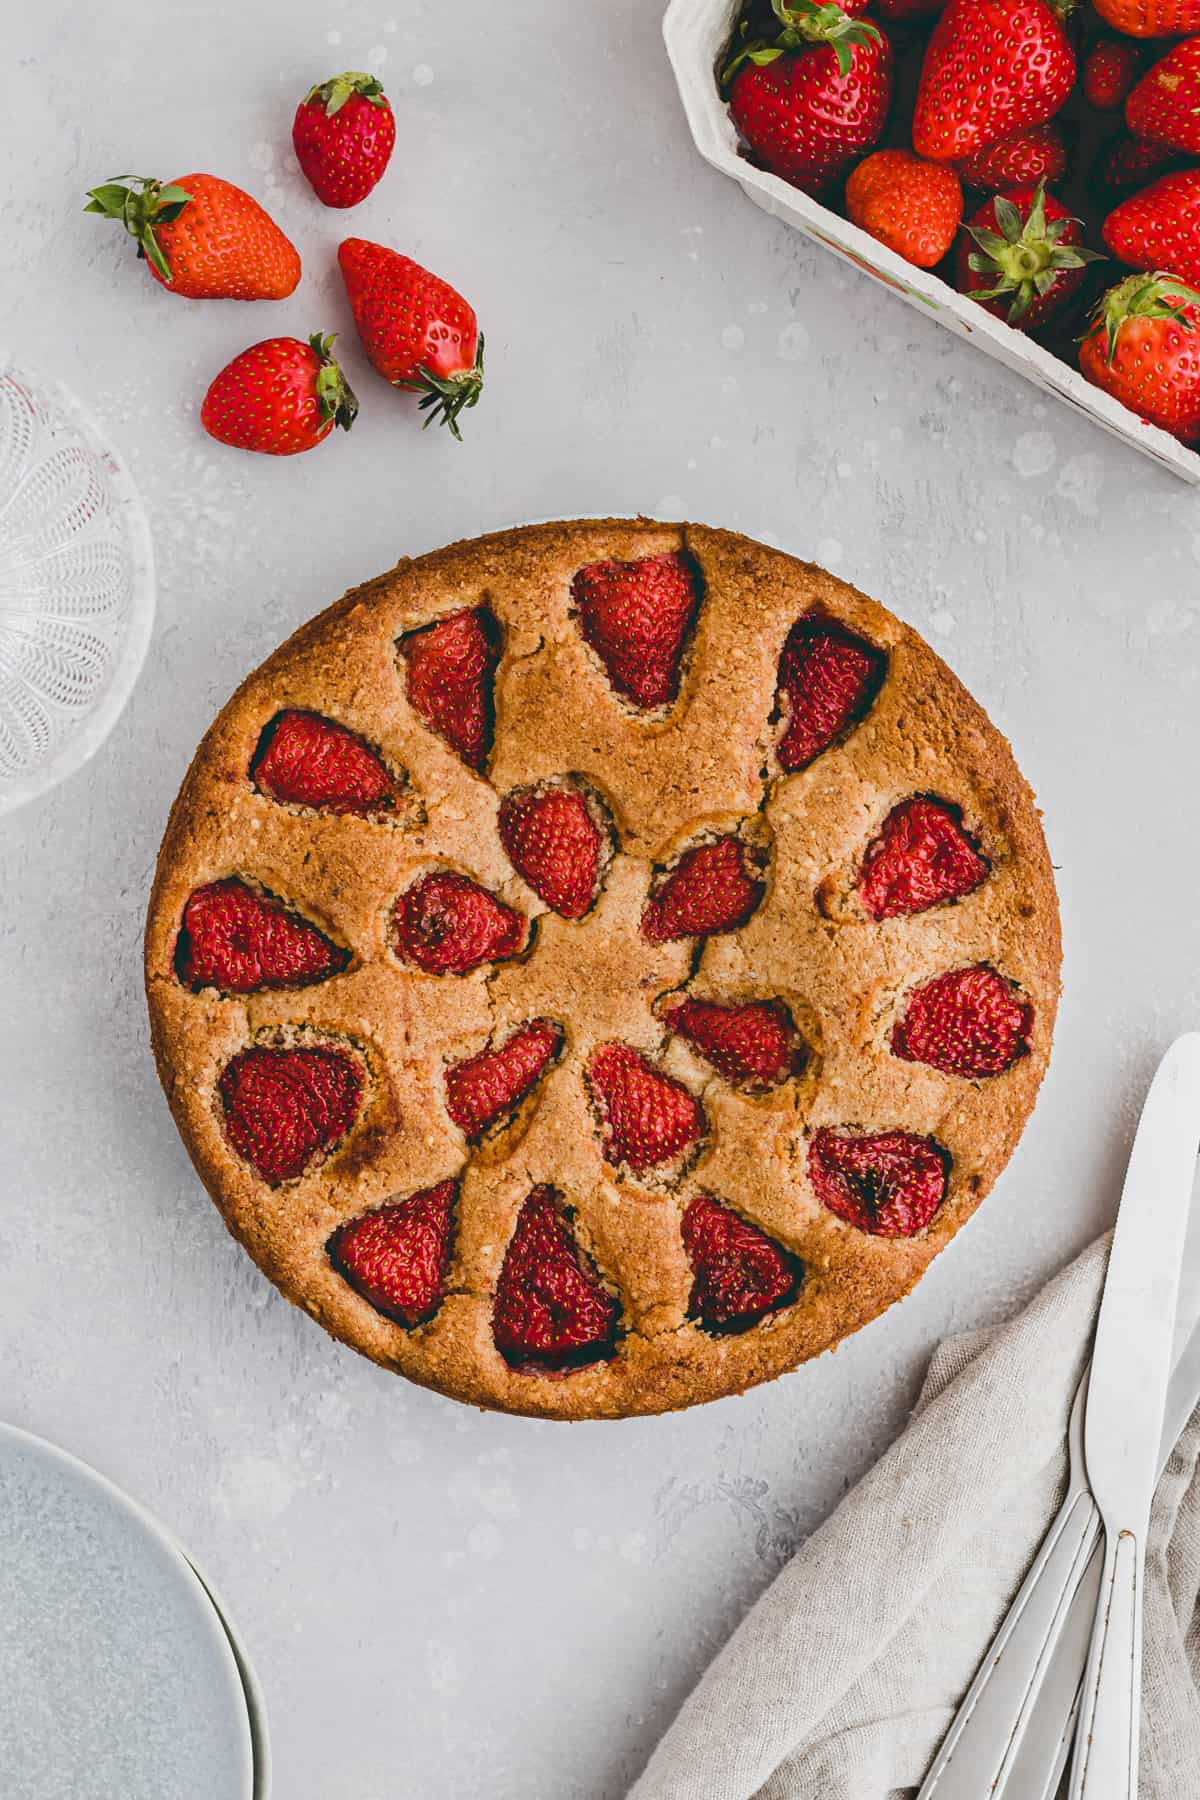 easy strawberry cake next to a few strawberries